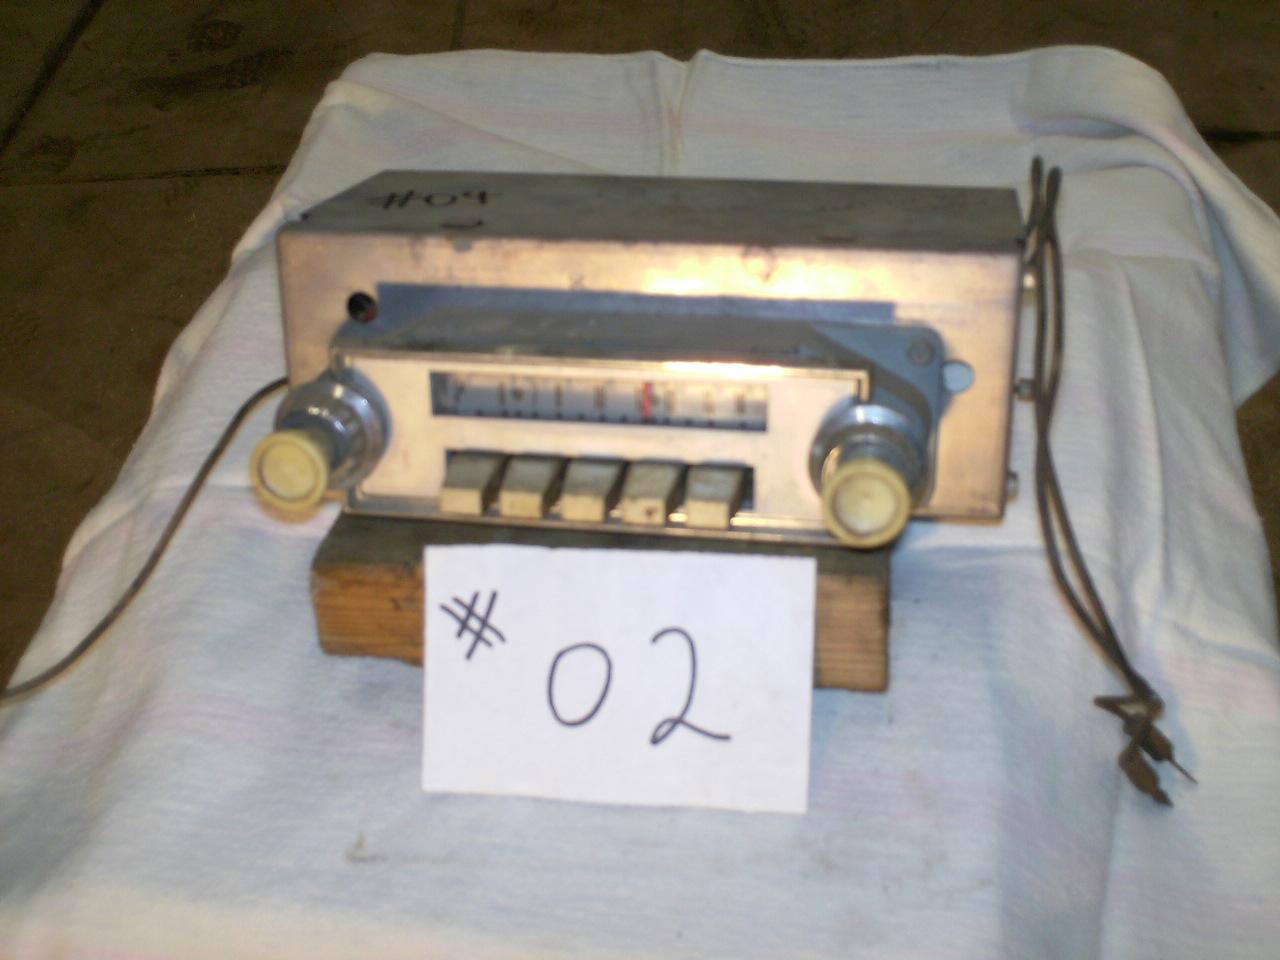 1952 Ford Car 1964 Ford Car & Radio | Shaneu0027s Car Parts markmcfarlin.com